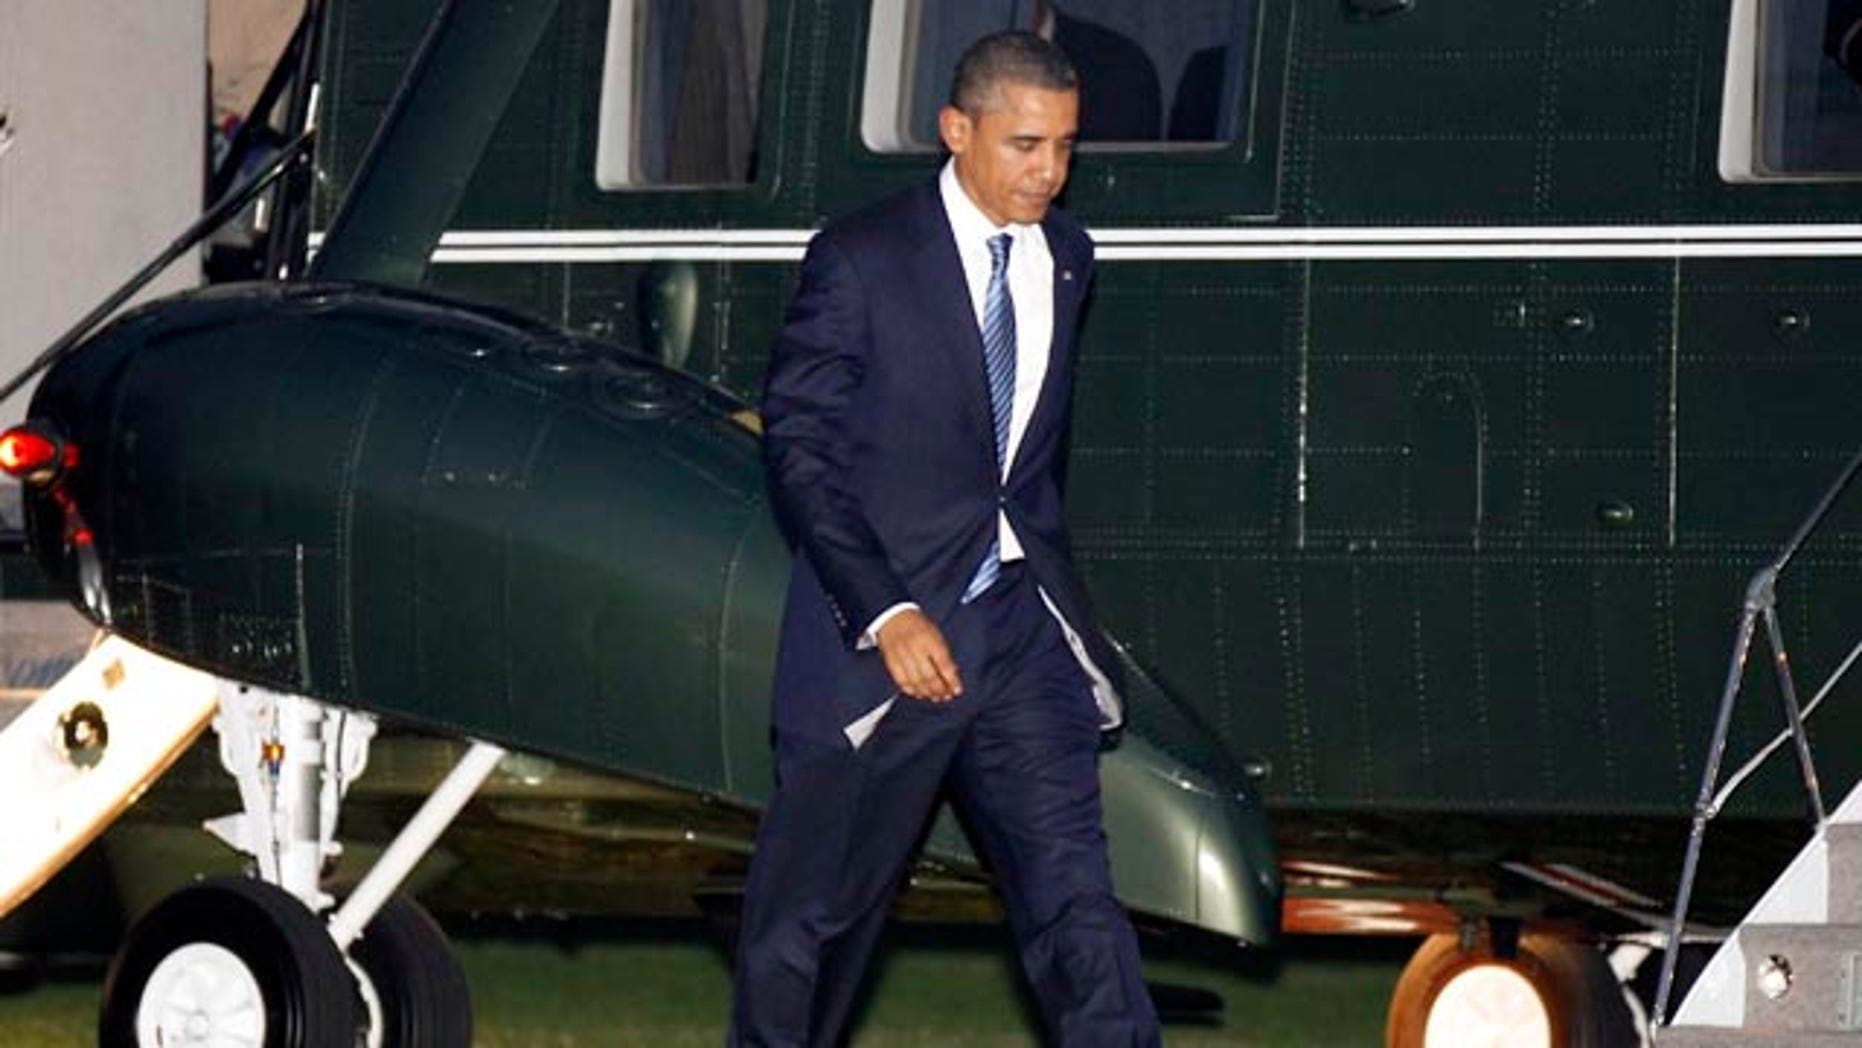 Nov. 23: President Barack Obama walks across the South Lawn of the White House in Washington.